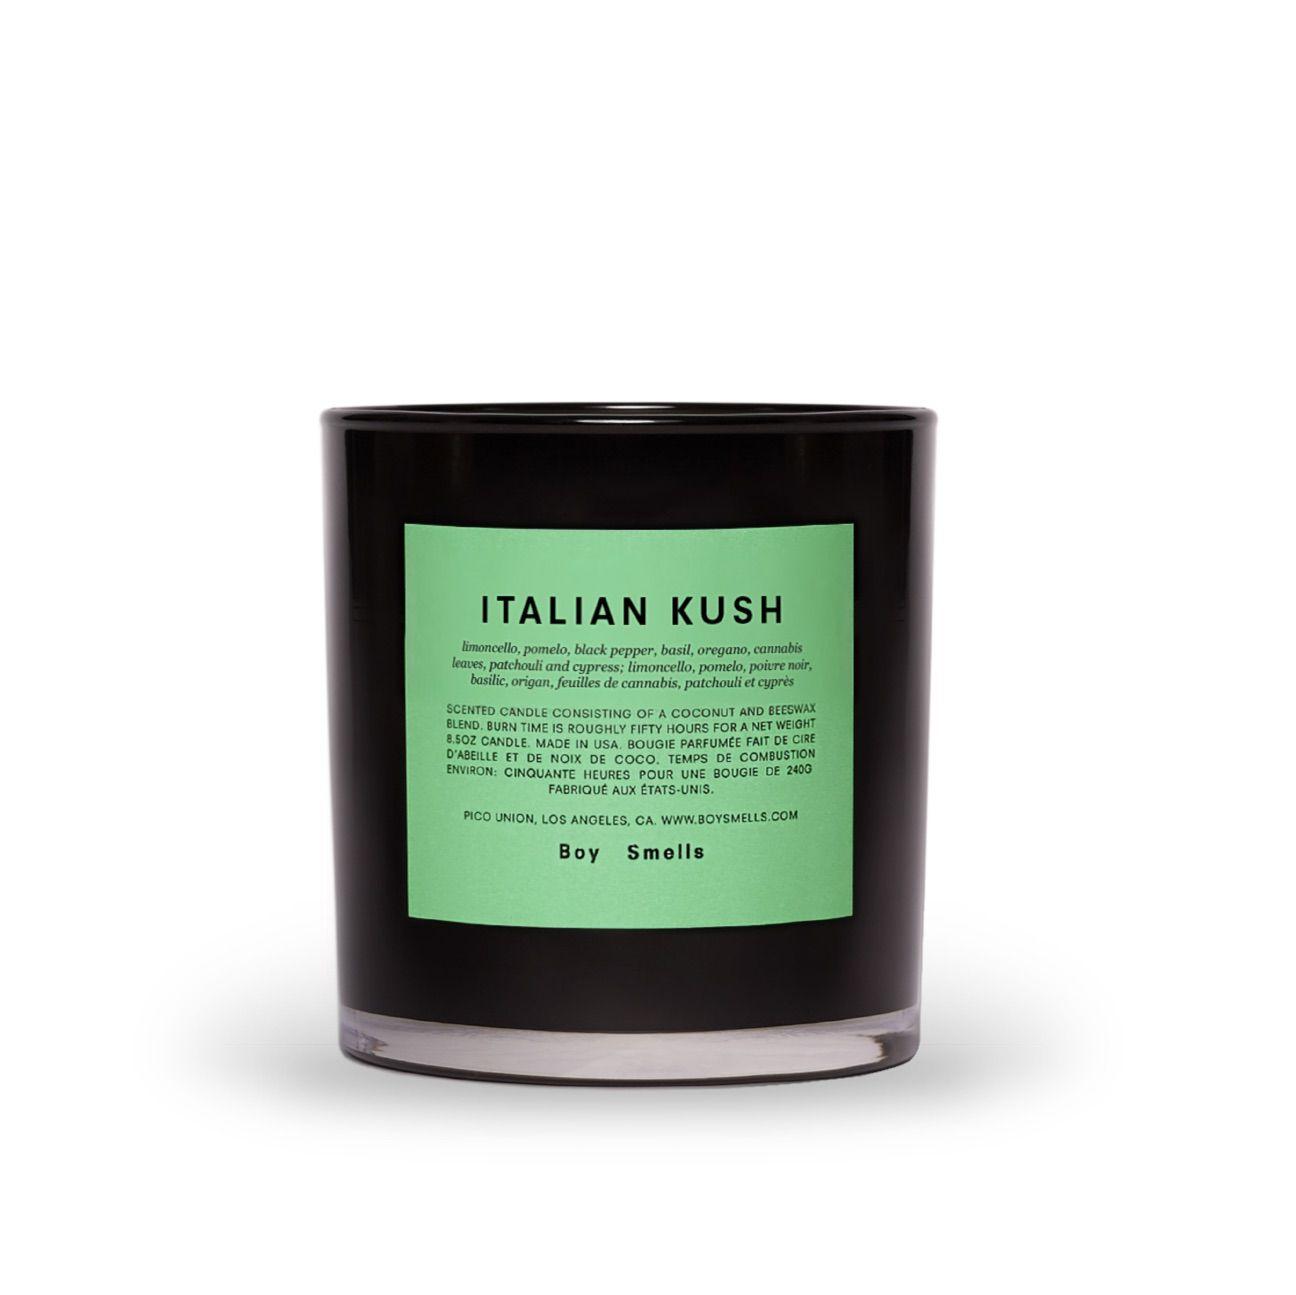 Italian Kush